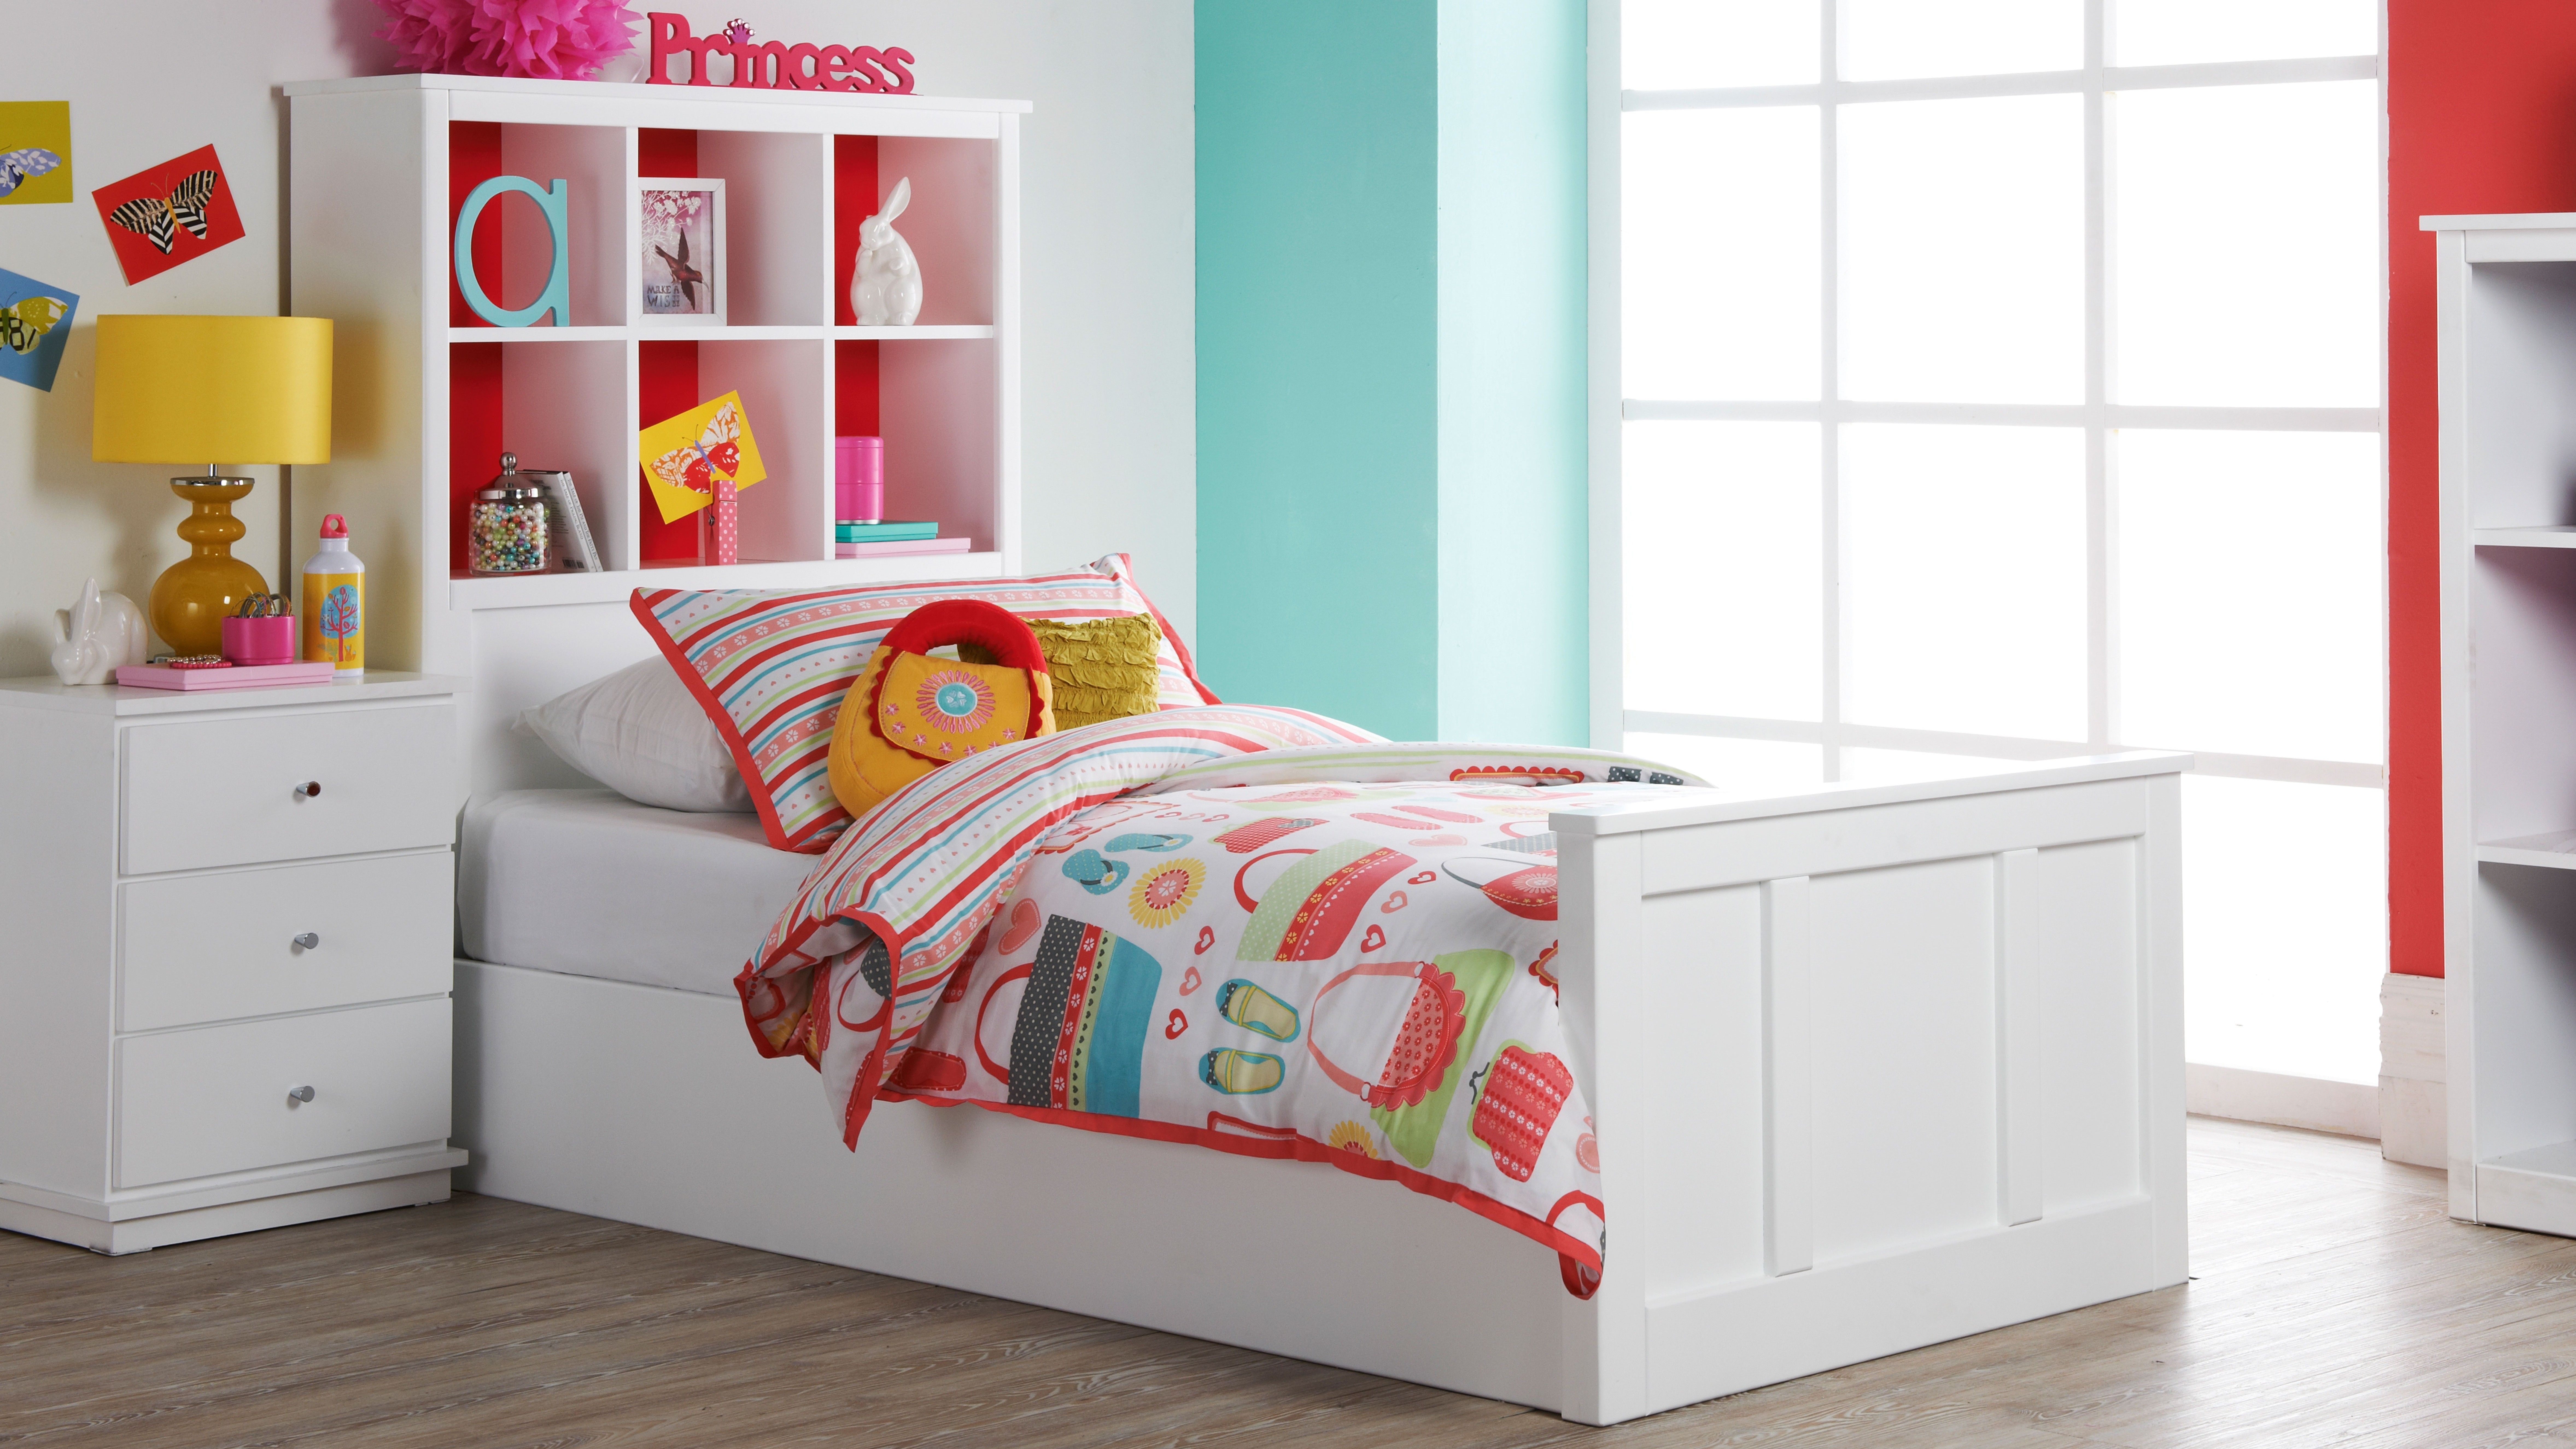 Lola Single Bed Harvey Norman I Like The Bookshelf Bedhead Good Idea Would